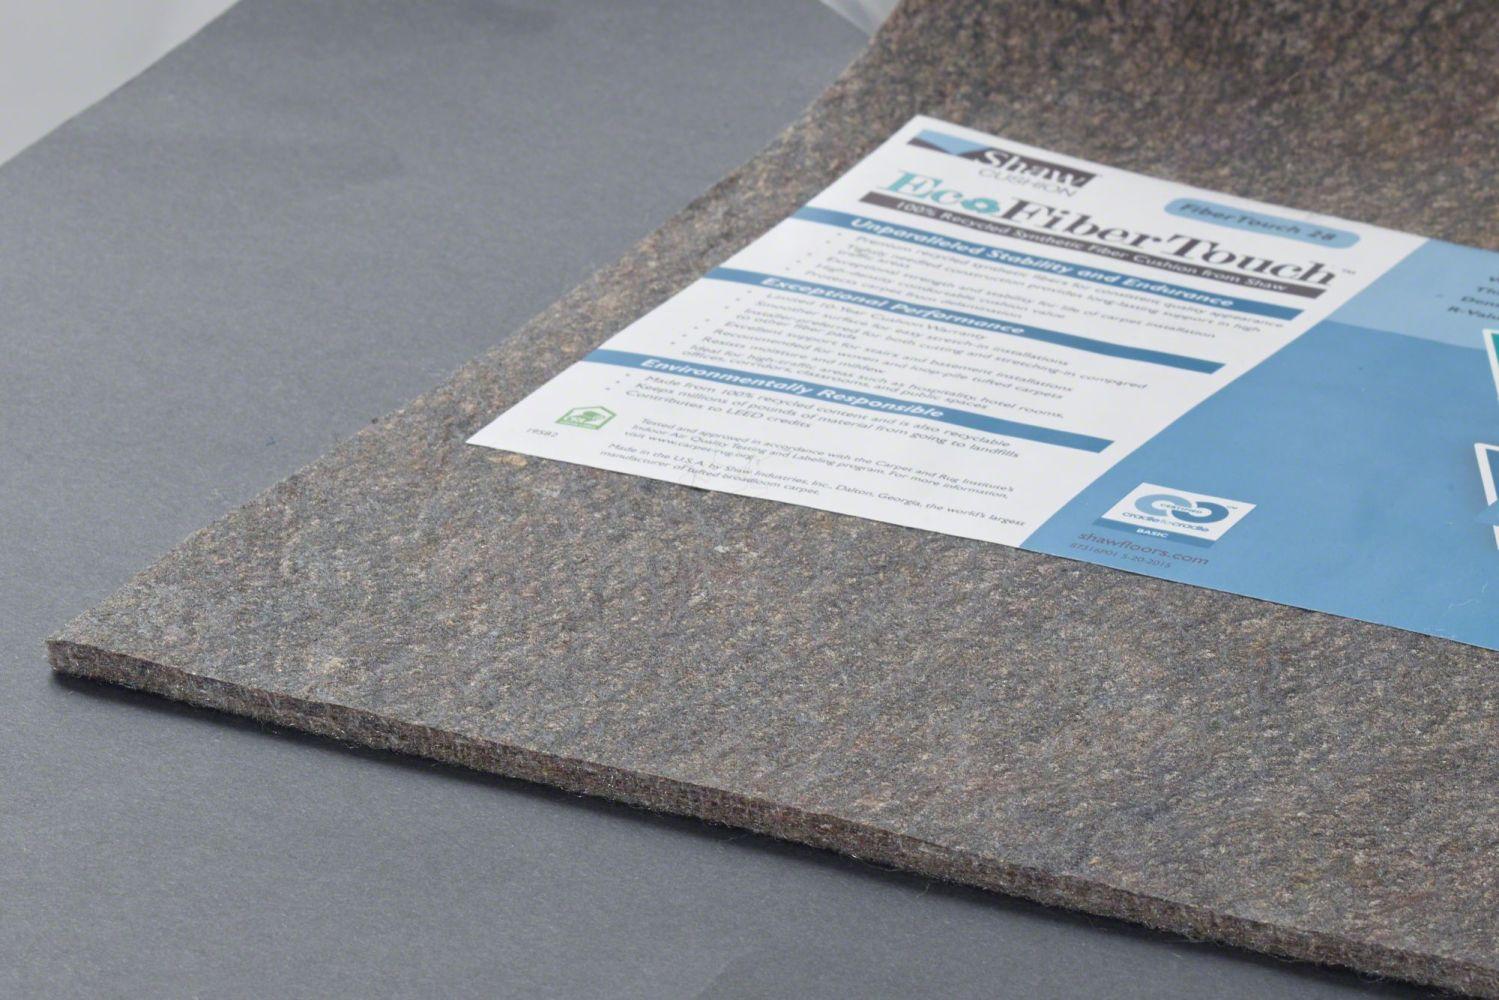 Shaw Floors Eco Edge Cushion Div3fibert28-6 Grey 00001_508PD